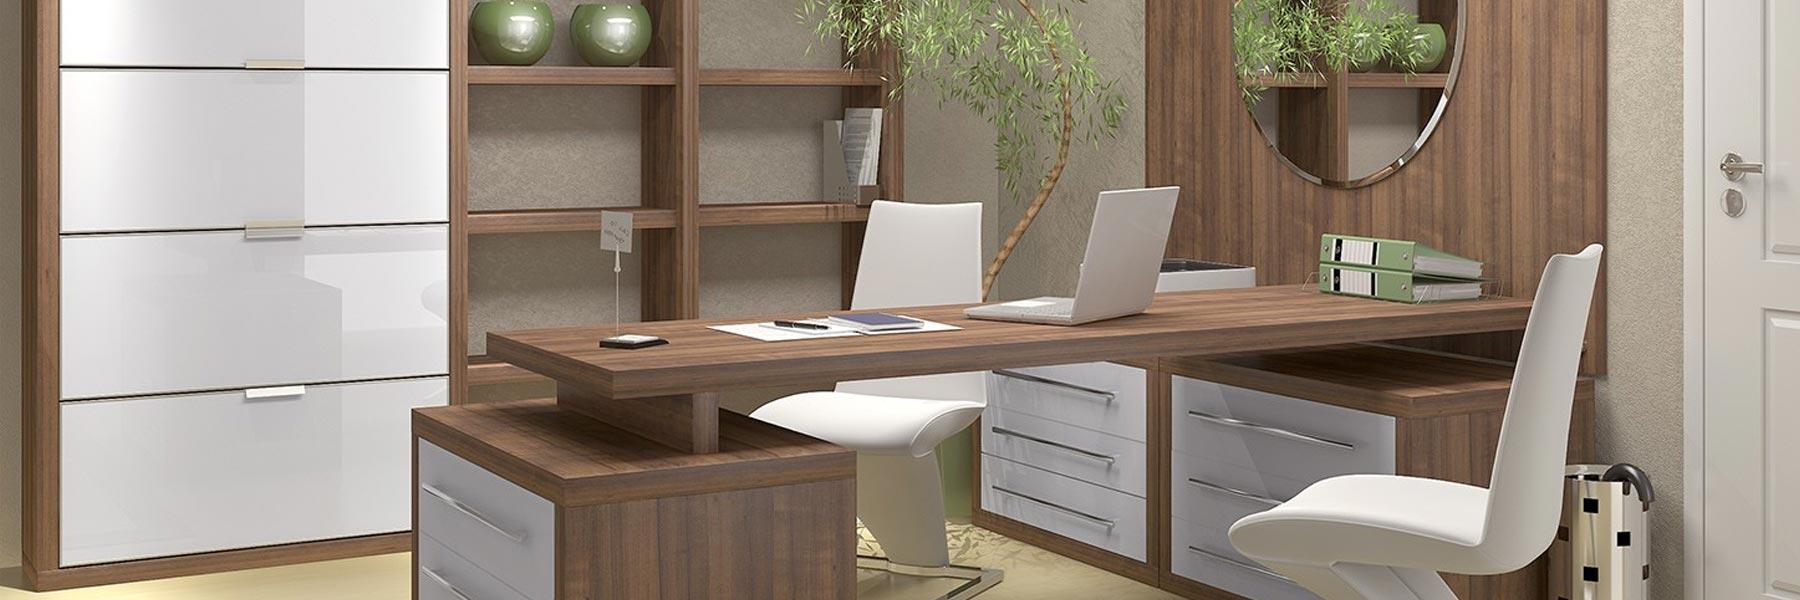 Office chair for sale jhb - Office Desks